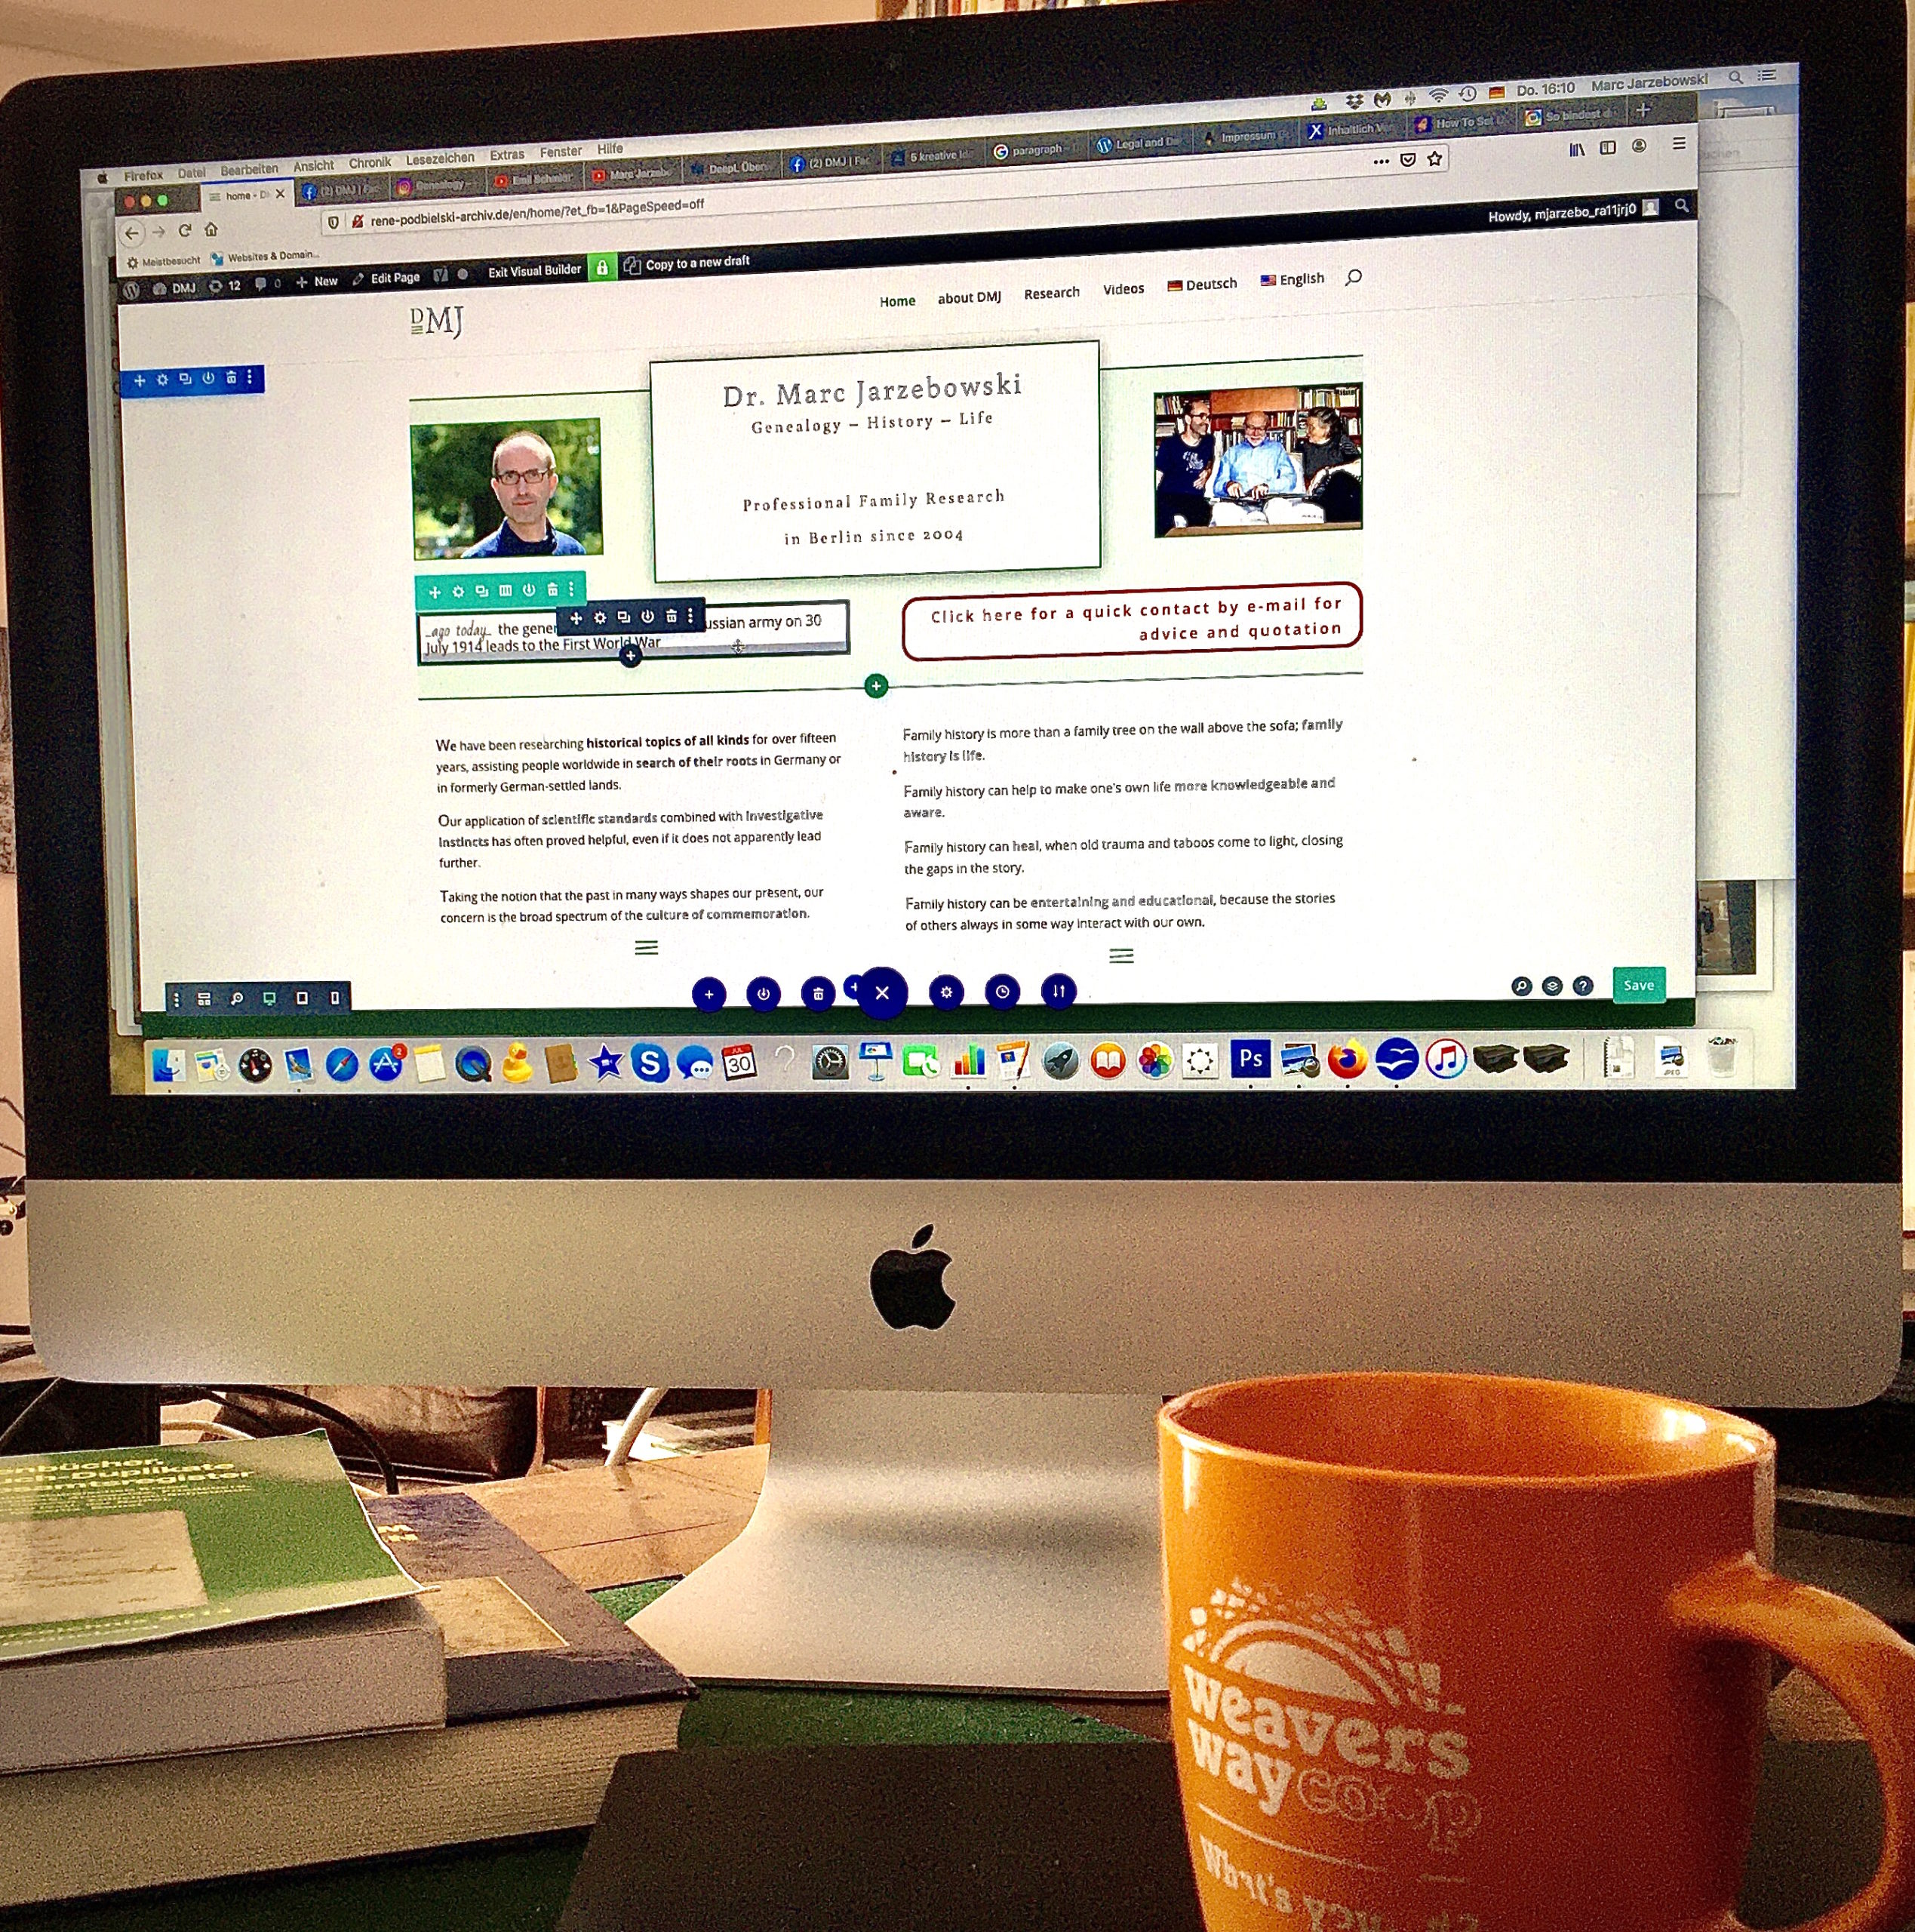 Home office: Programming of the new website of genealogist Marc Jarezbowski in Berlin